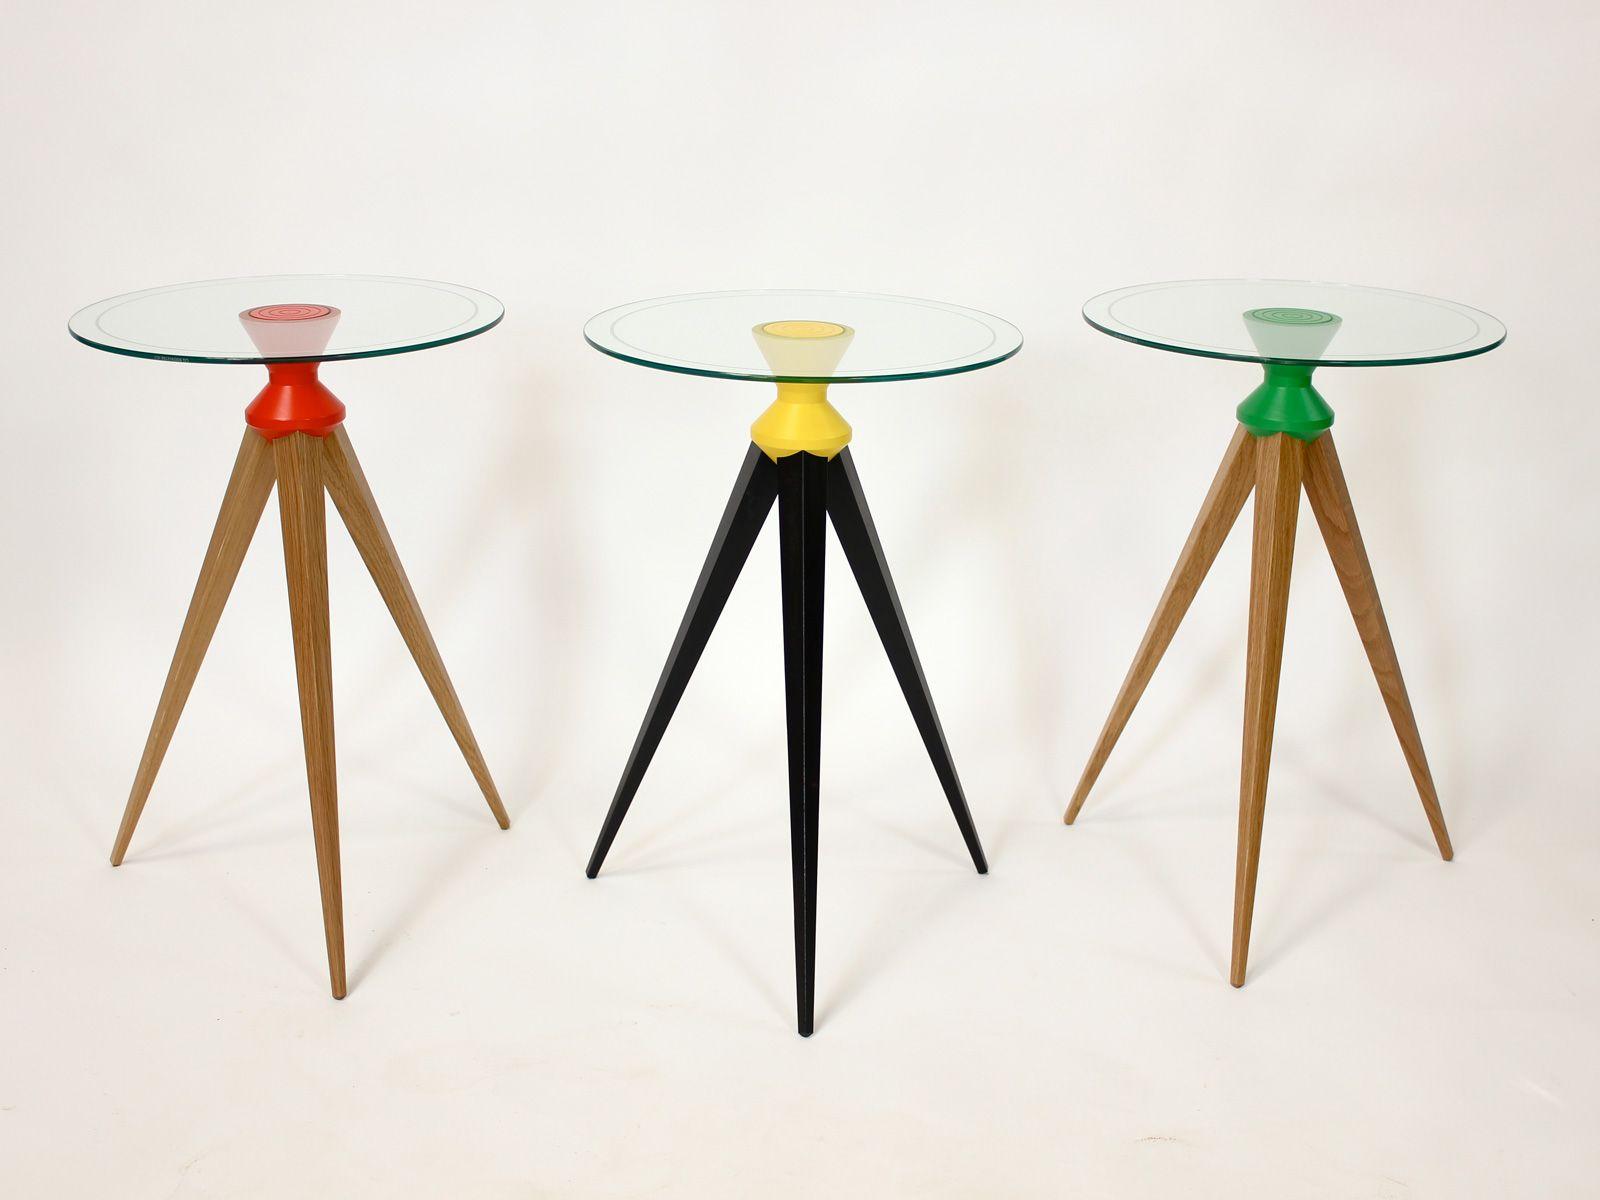 The Orbital Tripod Table